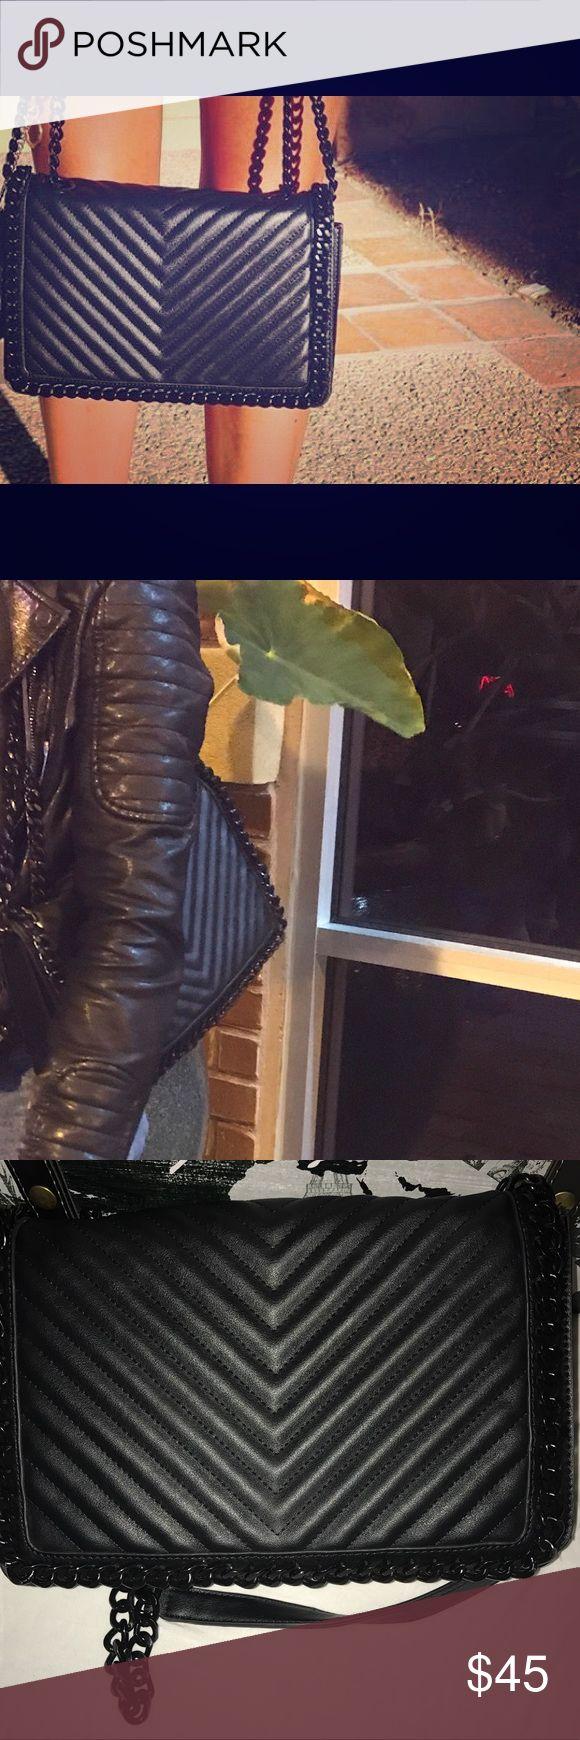 Aldo purse Stylish chained sling bag. Very spacious. Used a few times but looks very new. #stylish #cute #bag #aldo #purse #black Aldo Bags Crossbody Bags